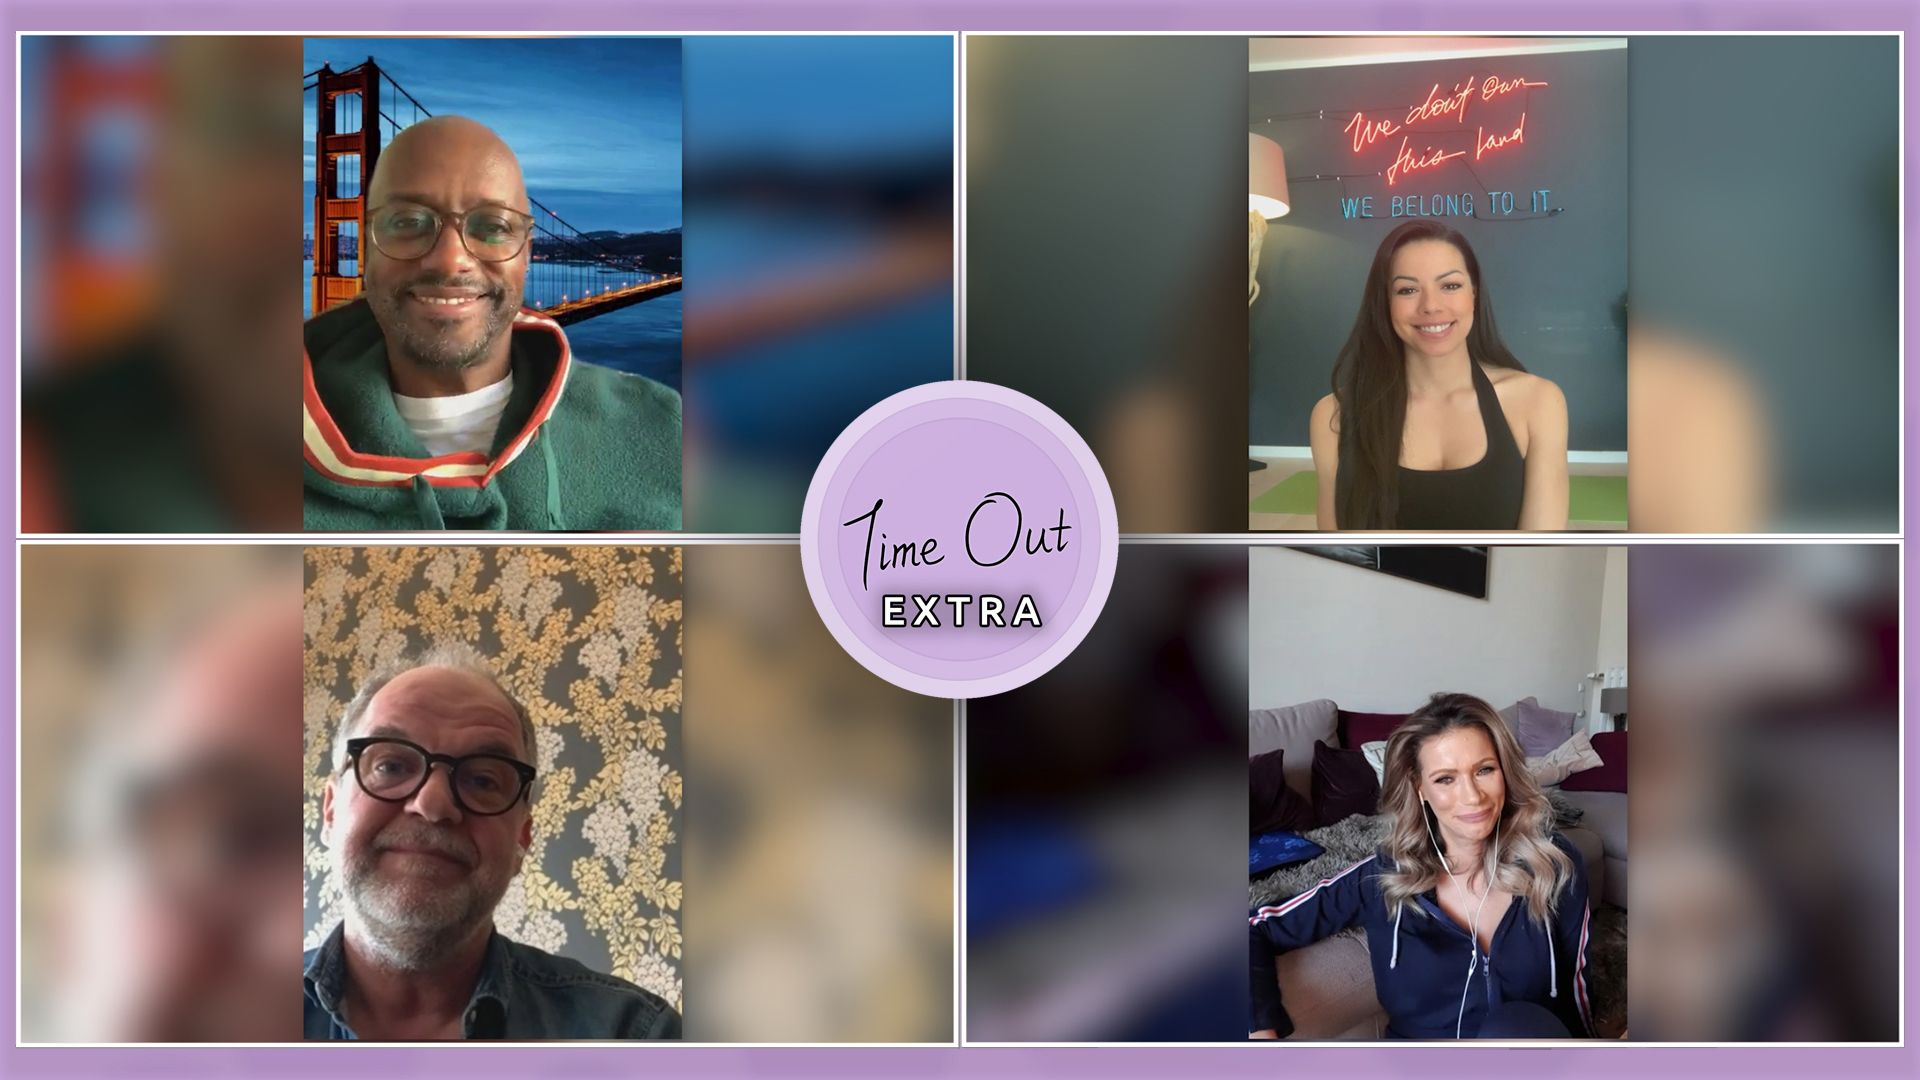 Promi-Talk in der Corona-Krise: Yared Dibaba, Marek Erhardt, Yasmina Filali und Fernanda Brandão